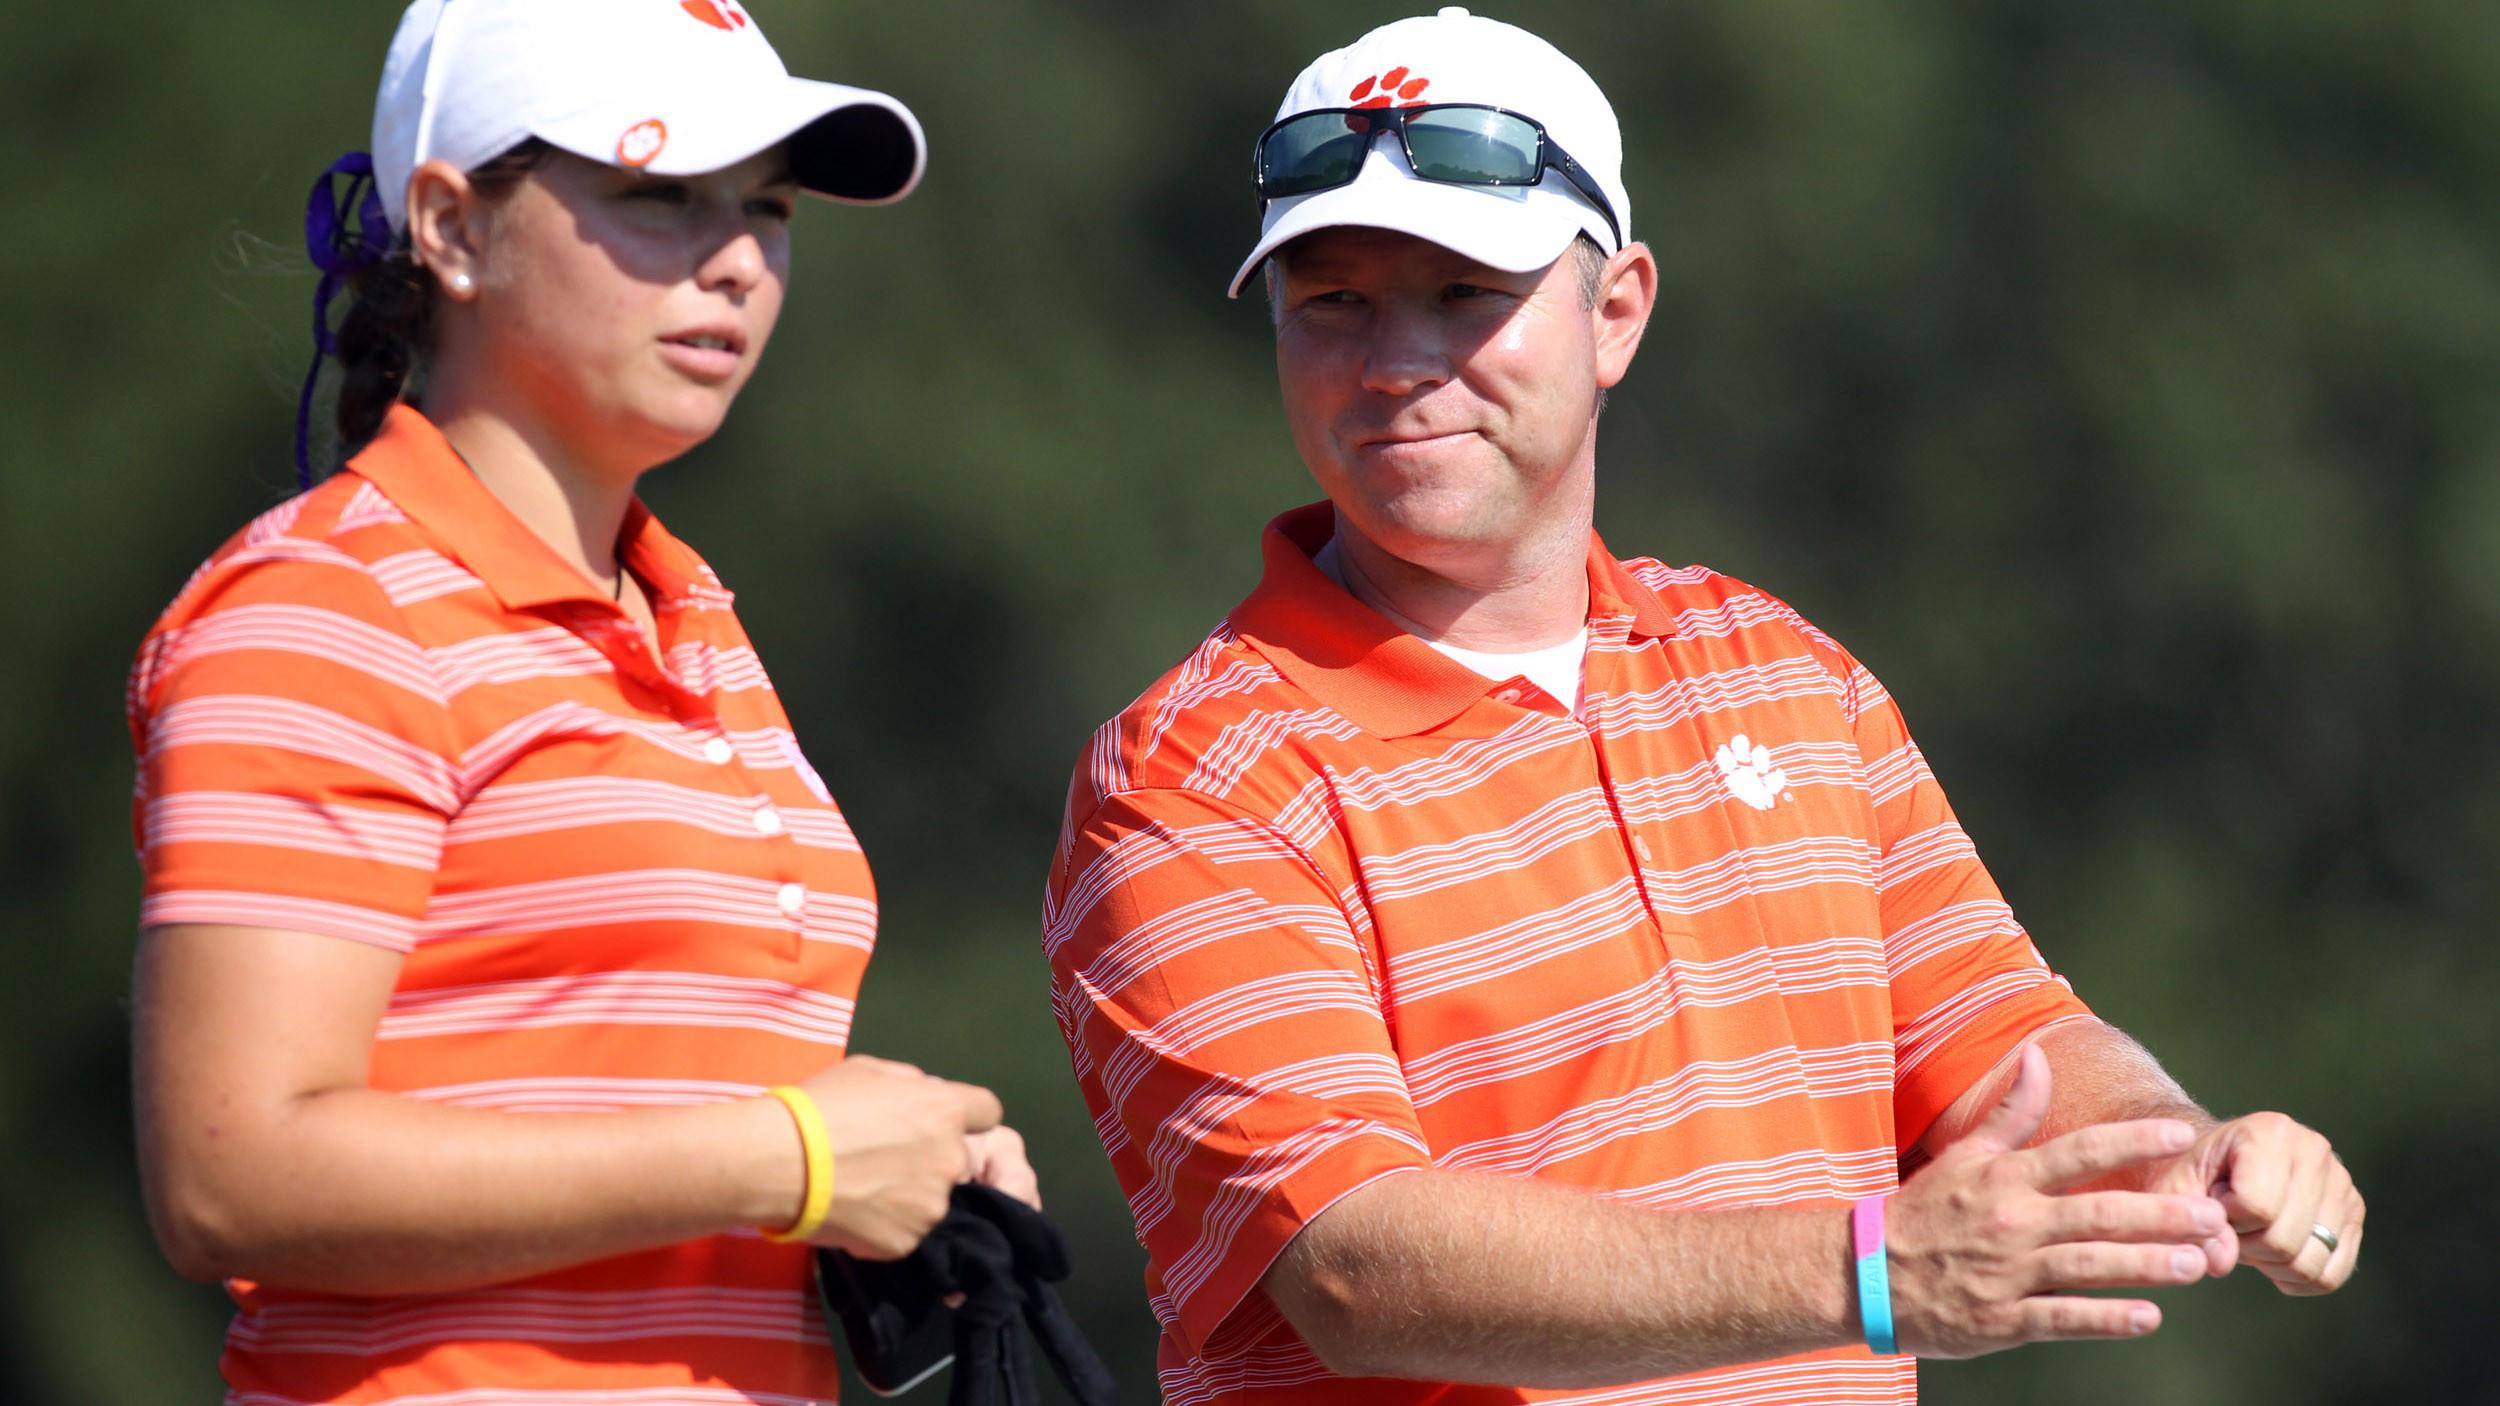 Clemson Ranked 11th in Final Fall Women's Golf World Poll